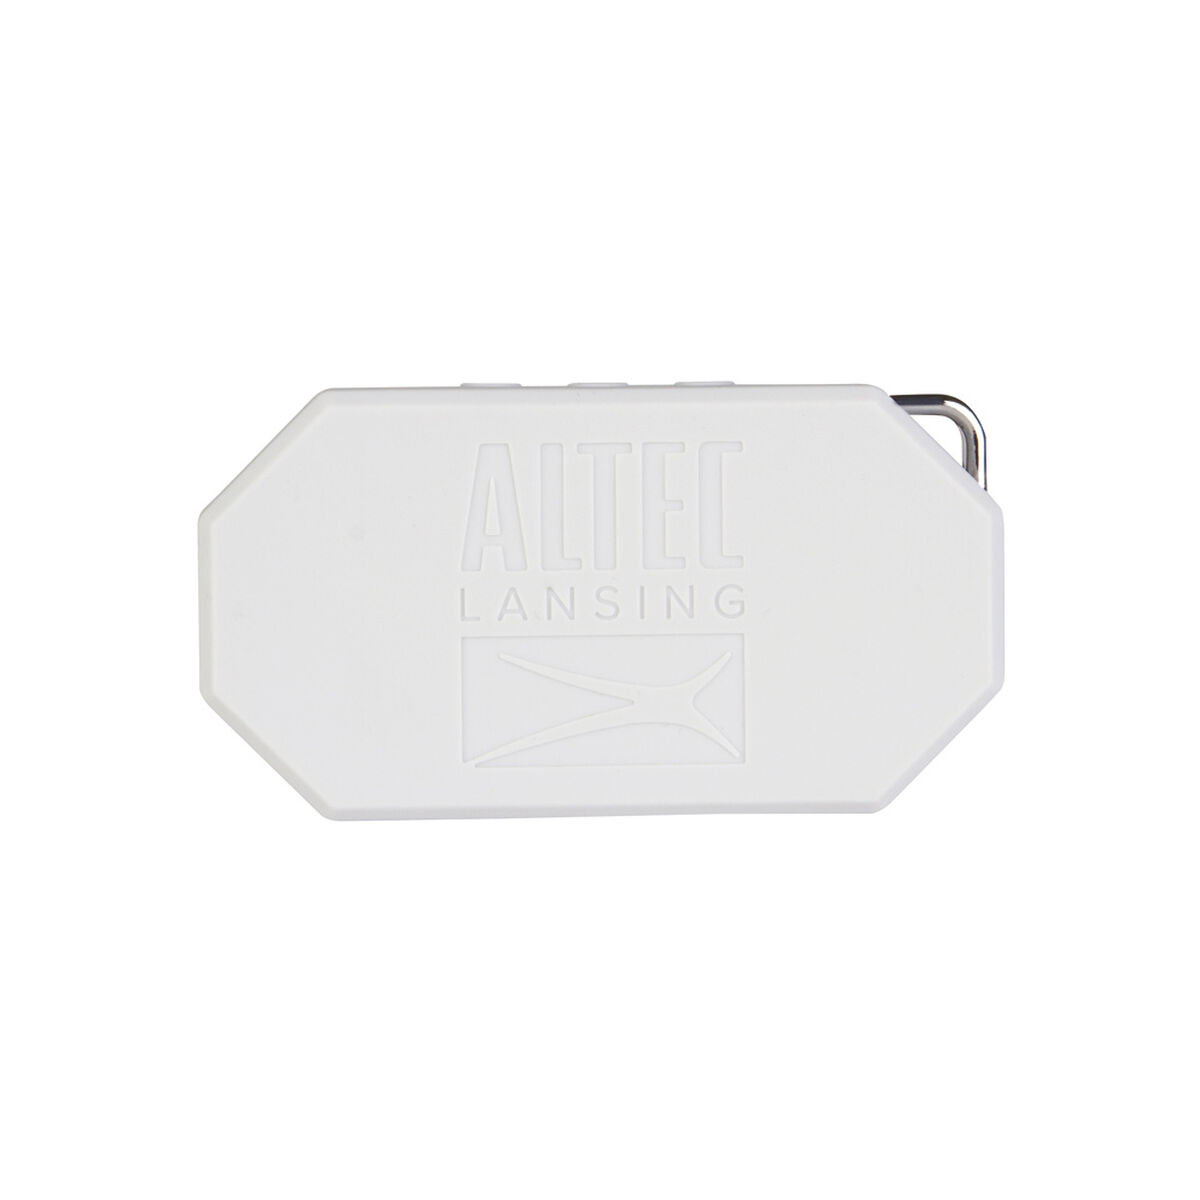 Parlante Bluetooth Altec Lansing IMW258 Gris